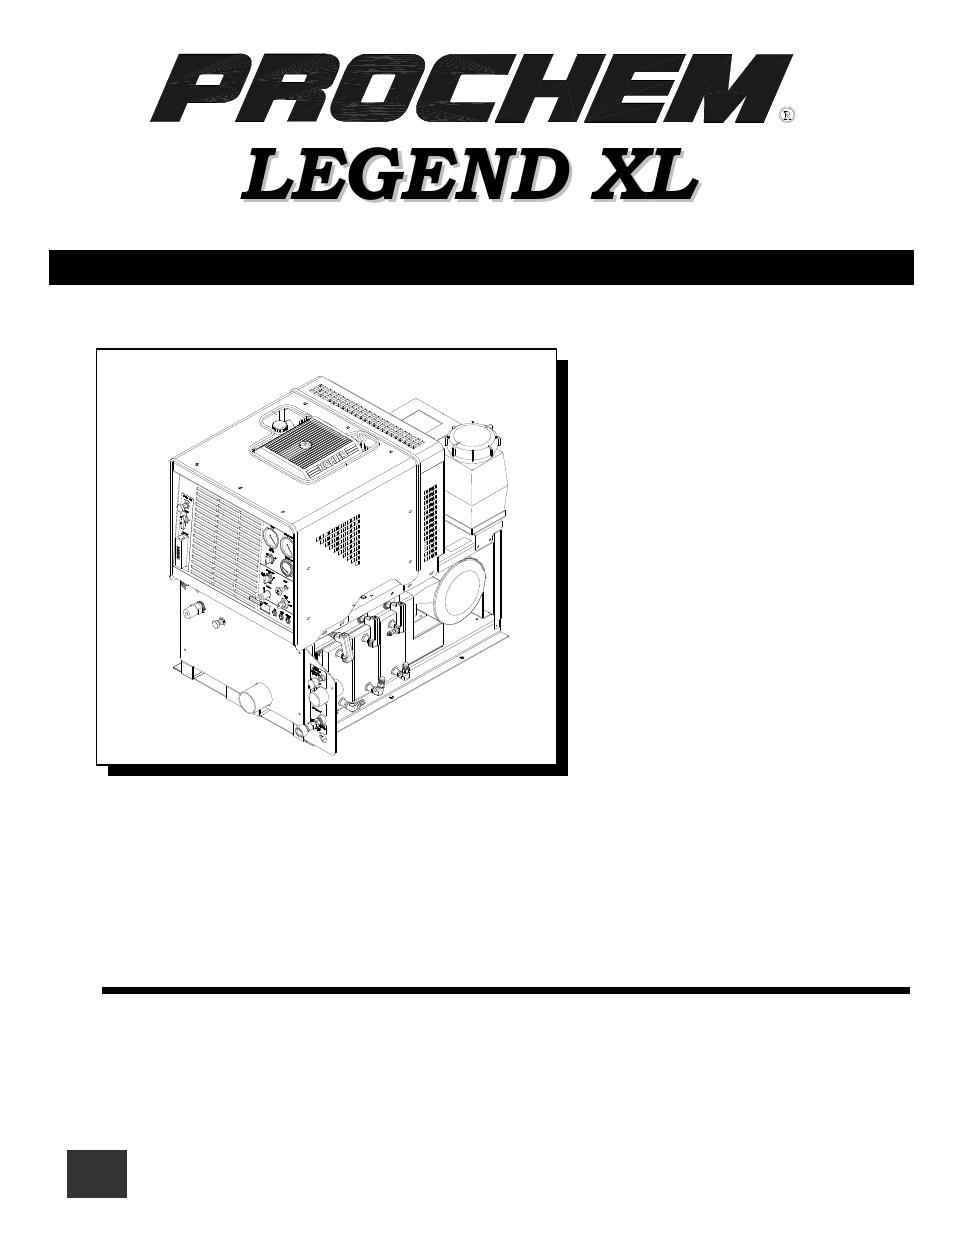 Prochem Legend Xl User Manual